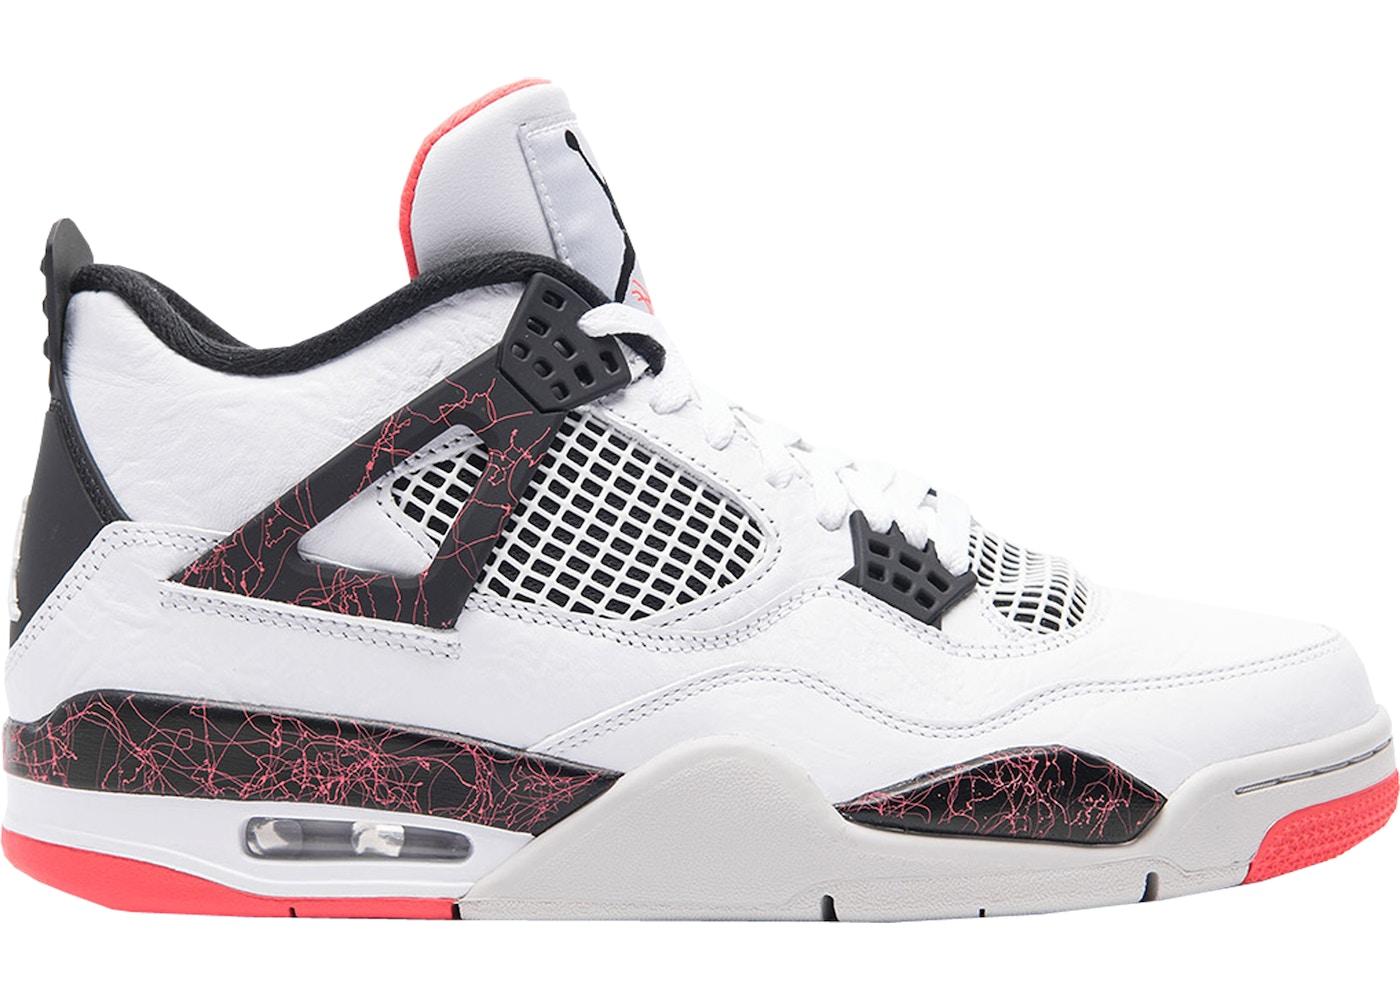 new product fce96 8f166 Jordan 4 Retro White Black Bright Crimson • Buy/Sell